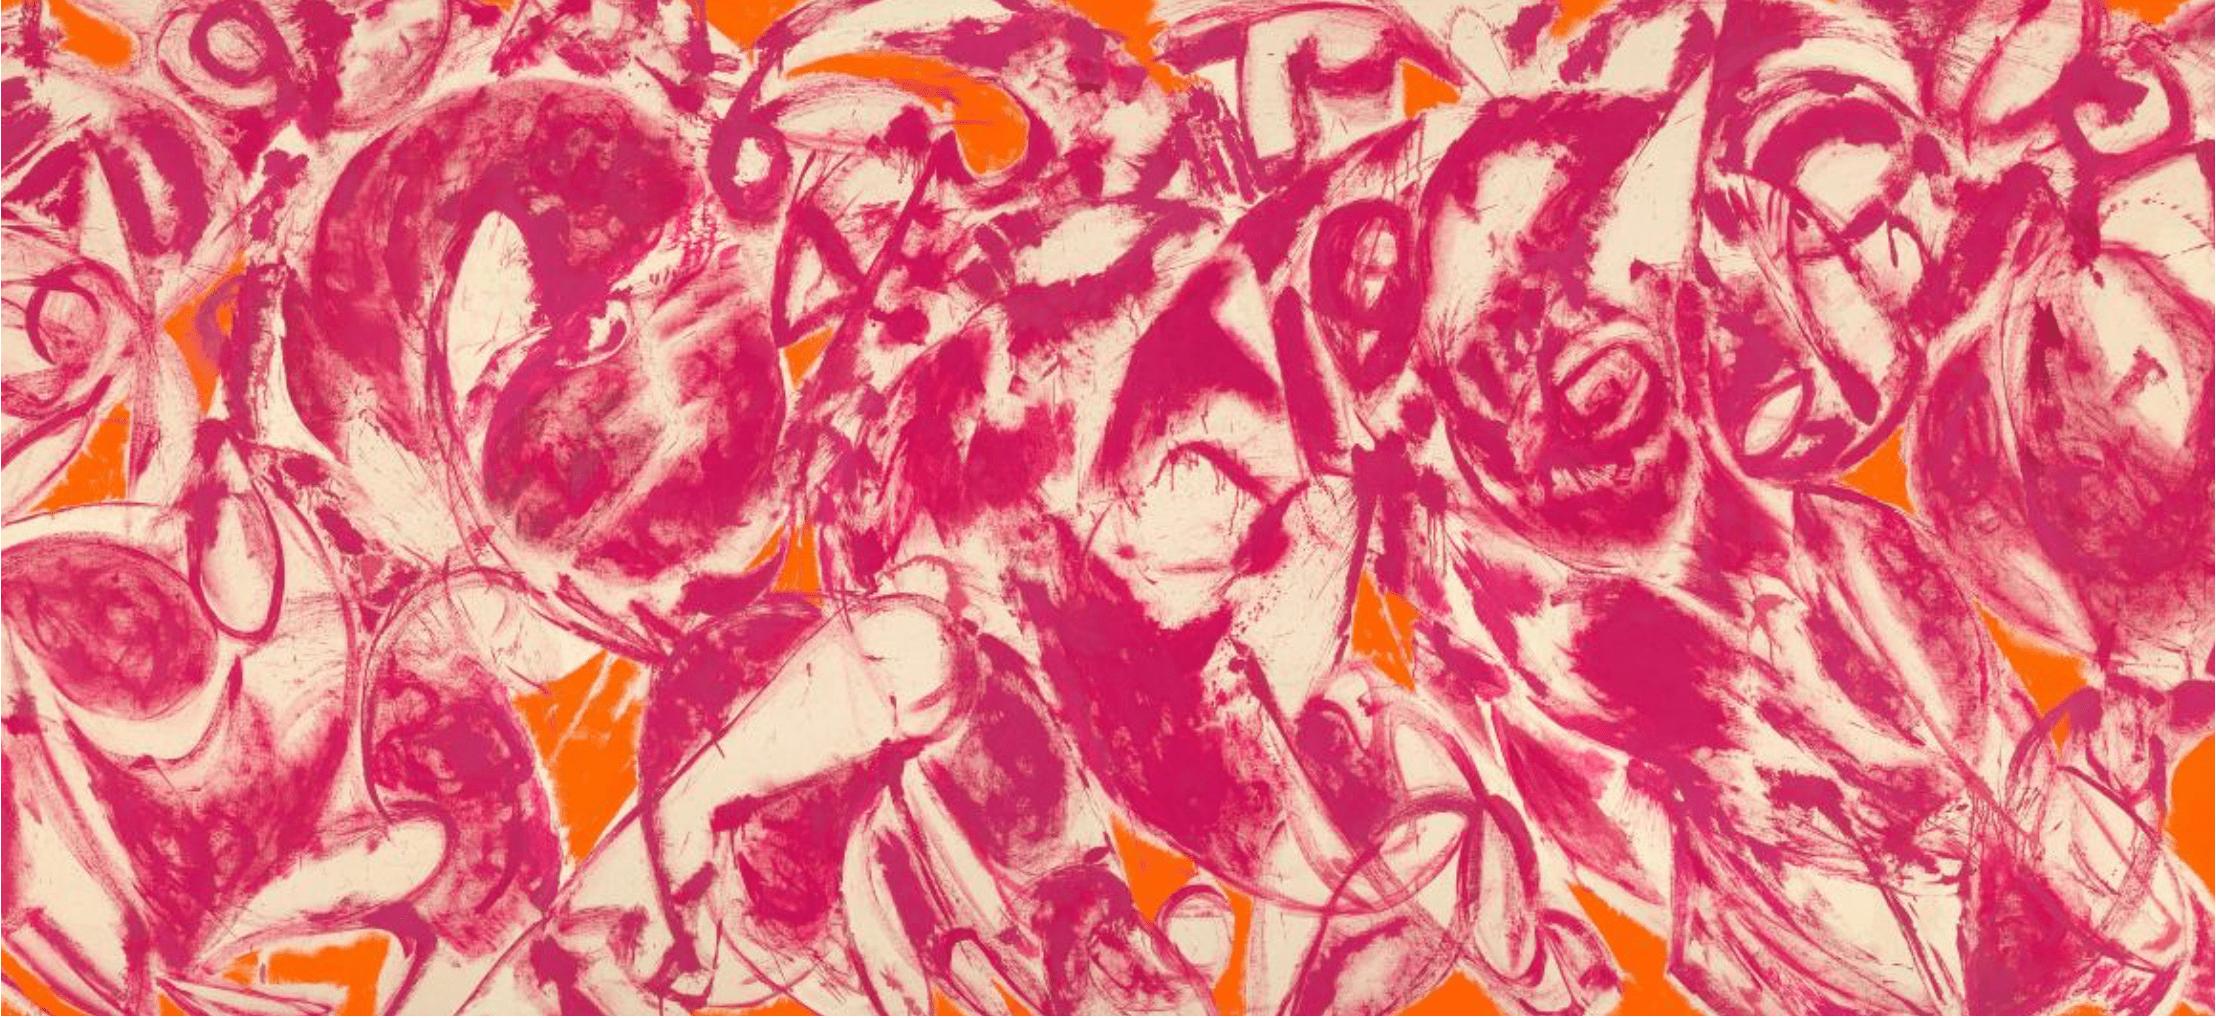 Lee Krasner: Two Masterpieces